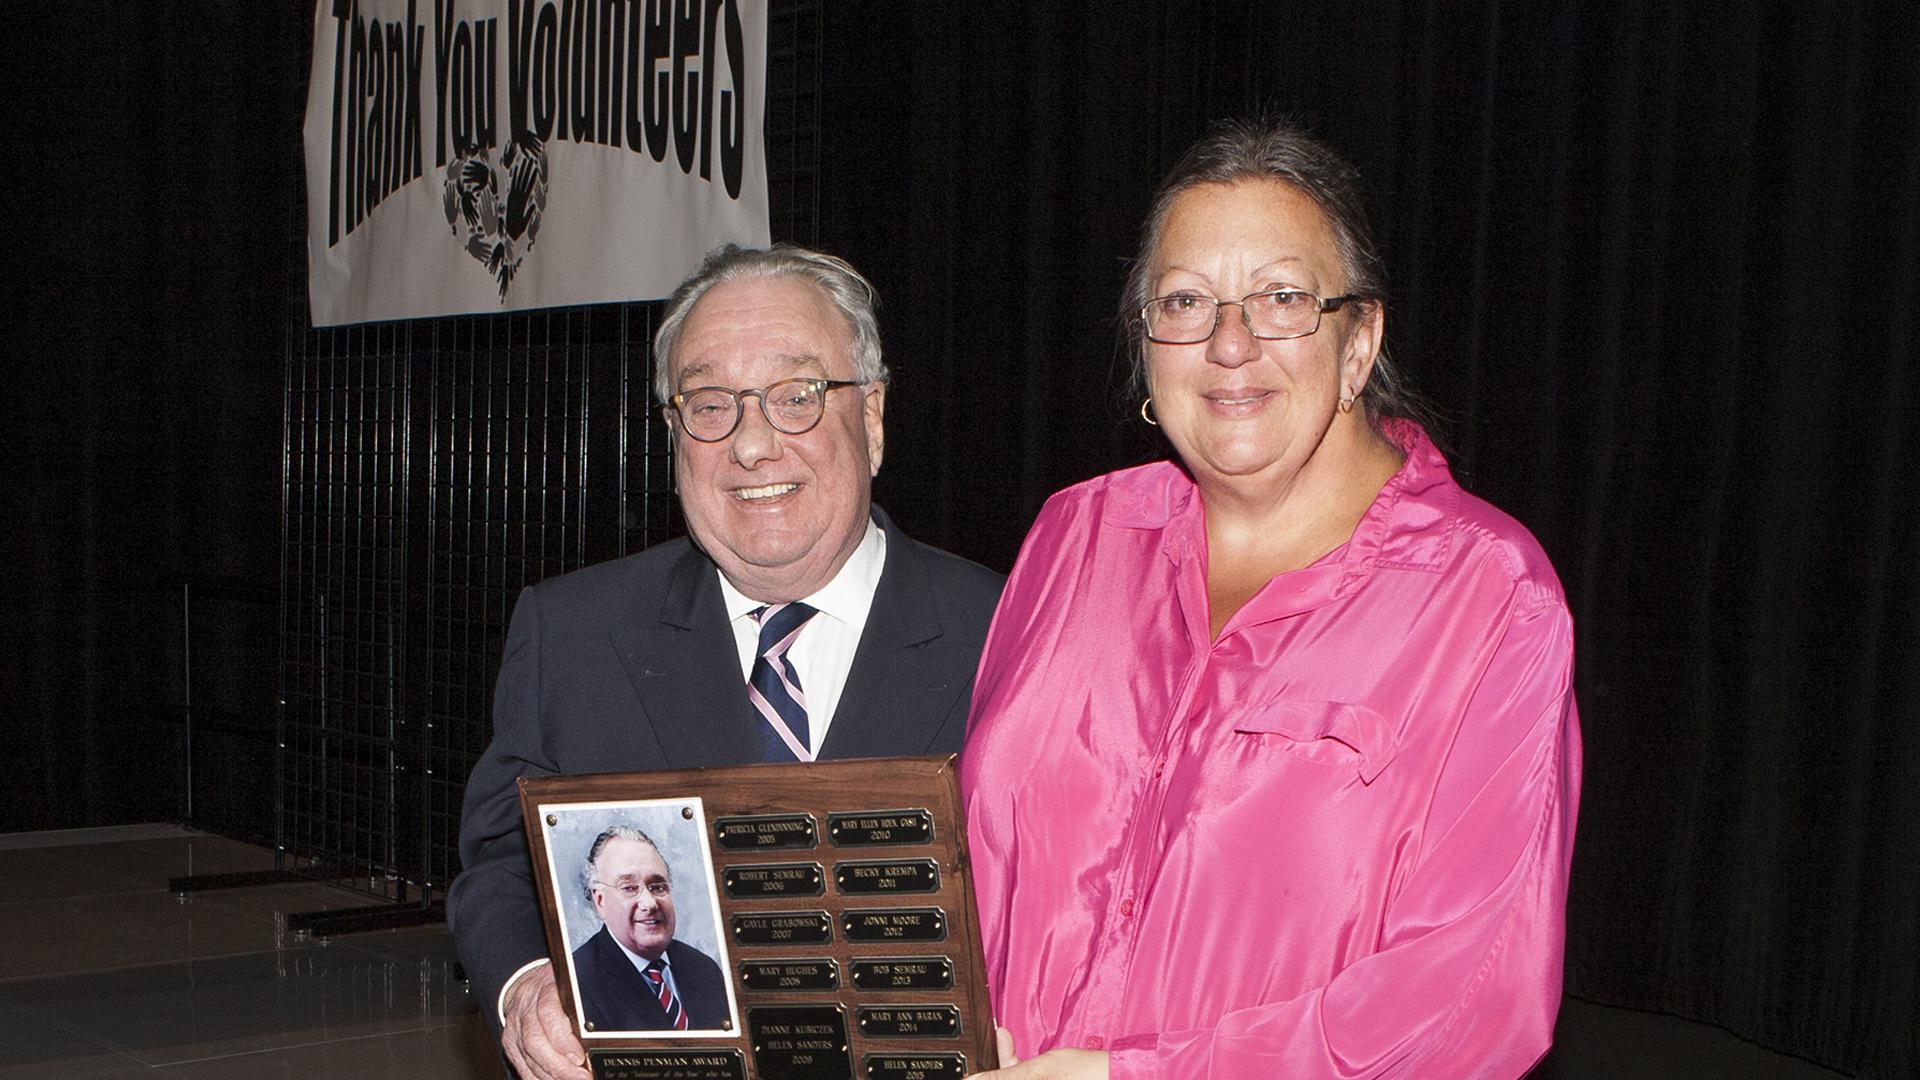 Donna Racczynski, recipient of the 2016 Dennis Penman Volunteer of the Year Award